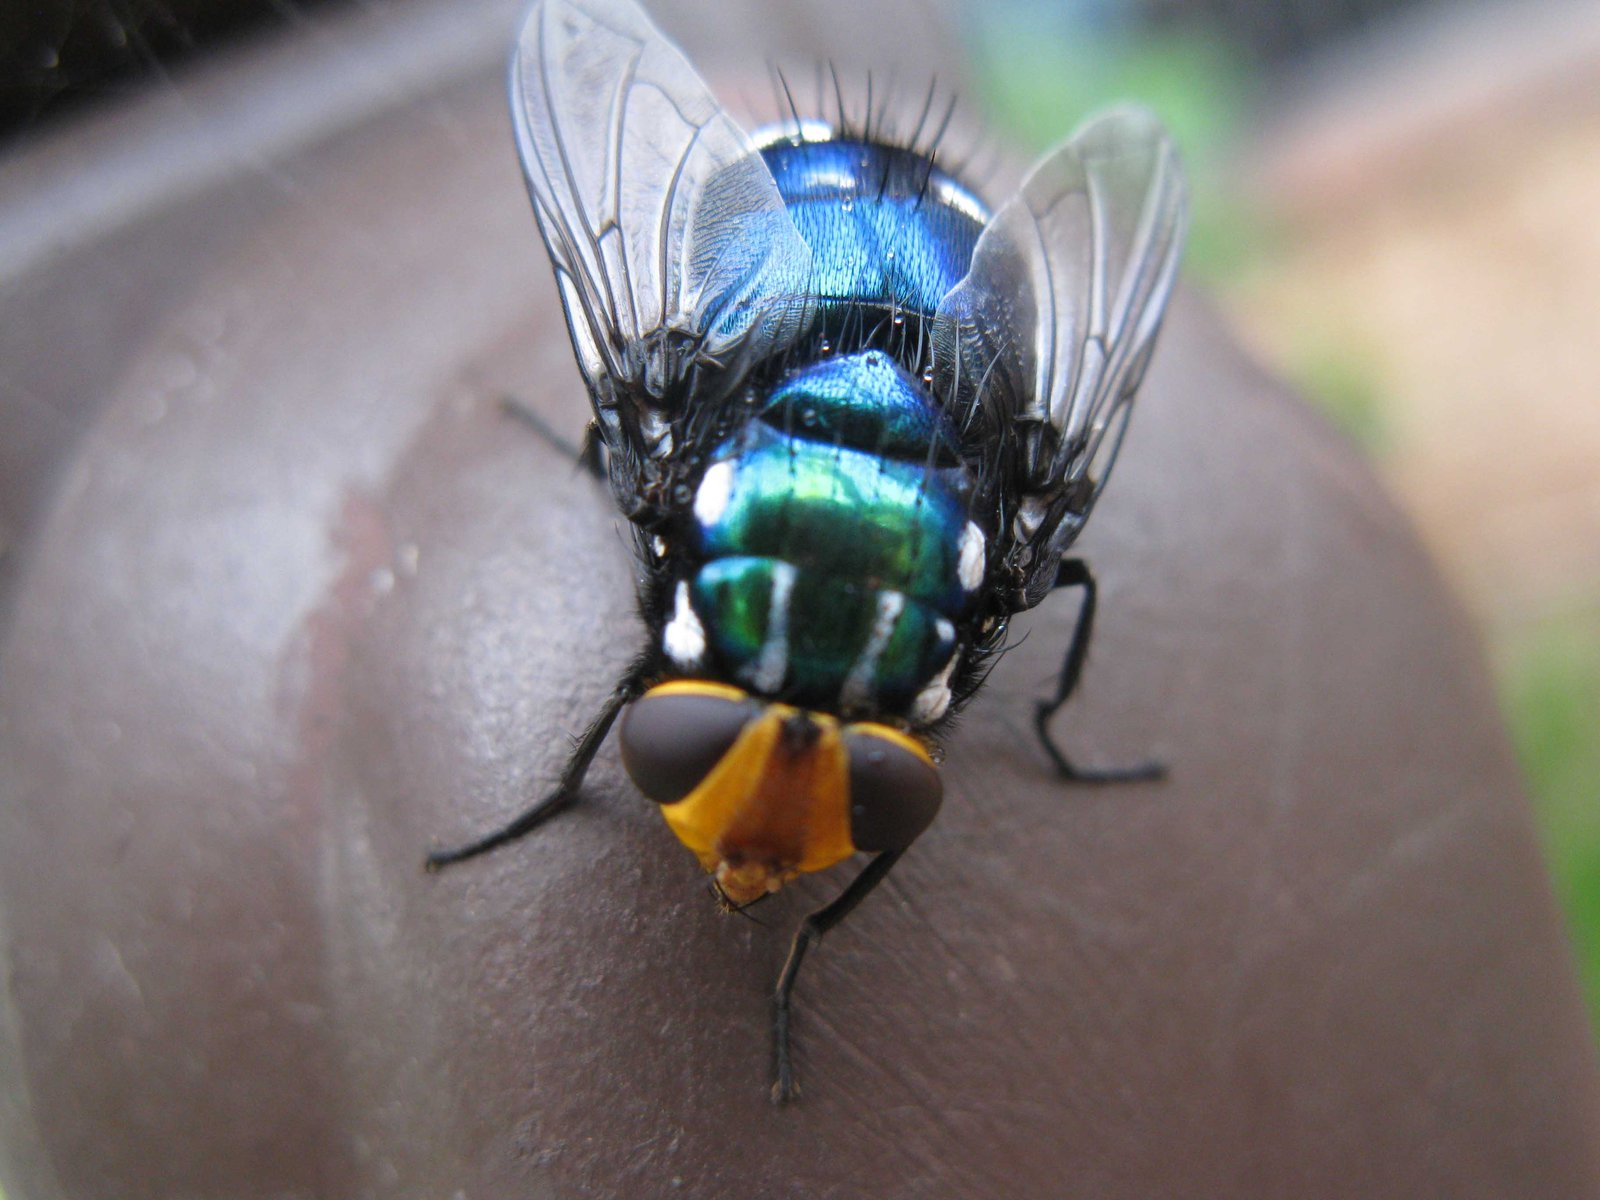 Snail Blowfly